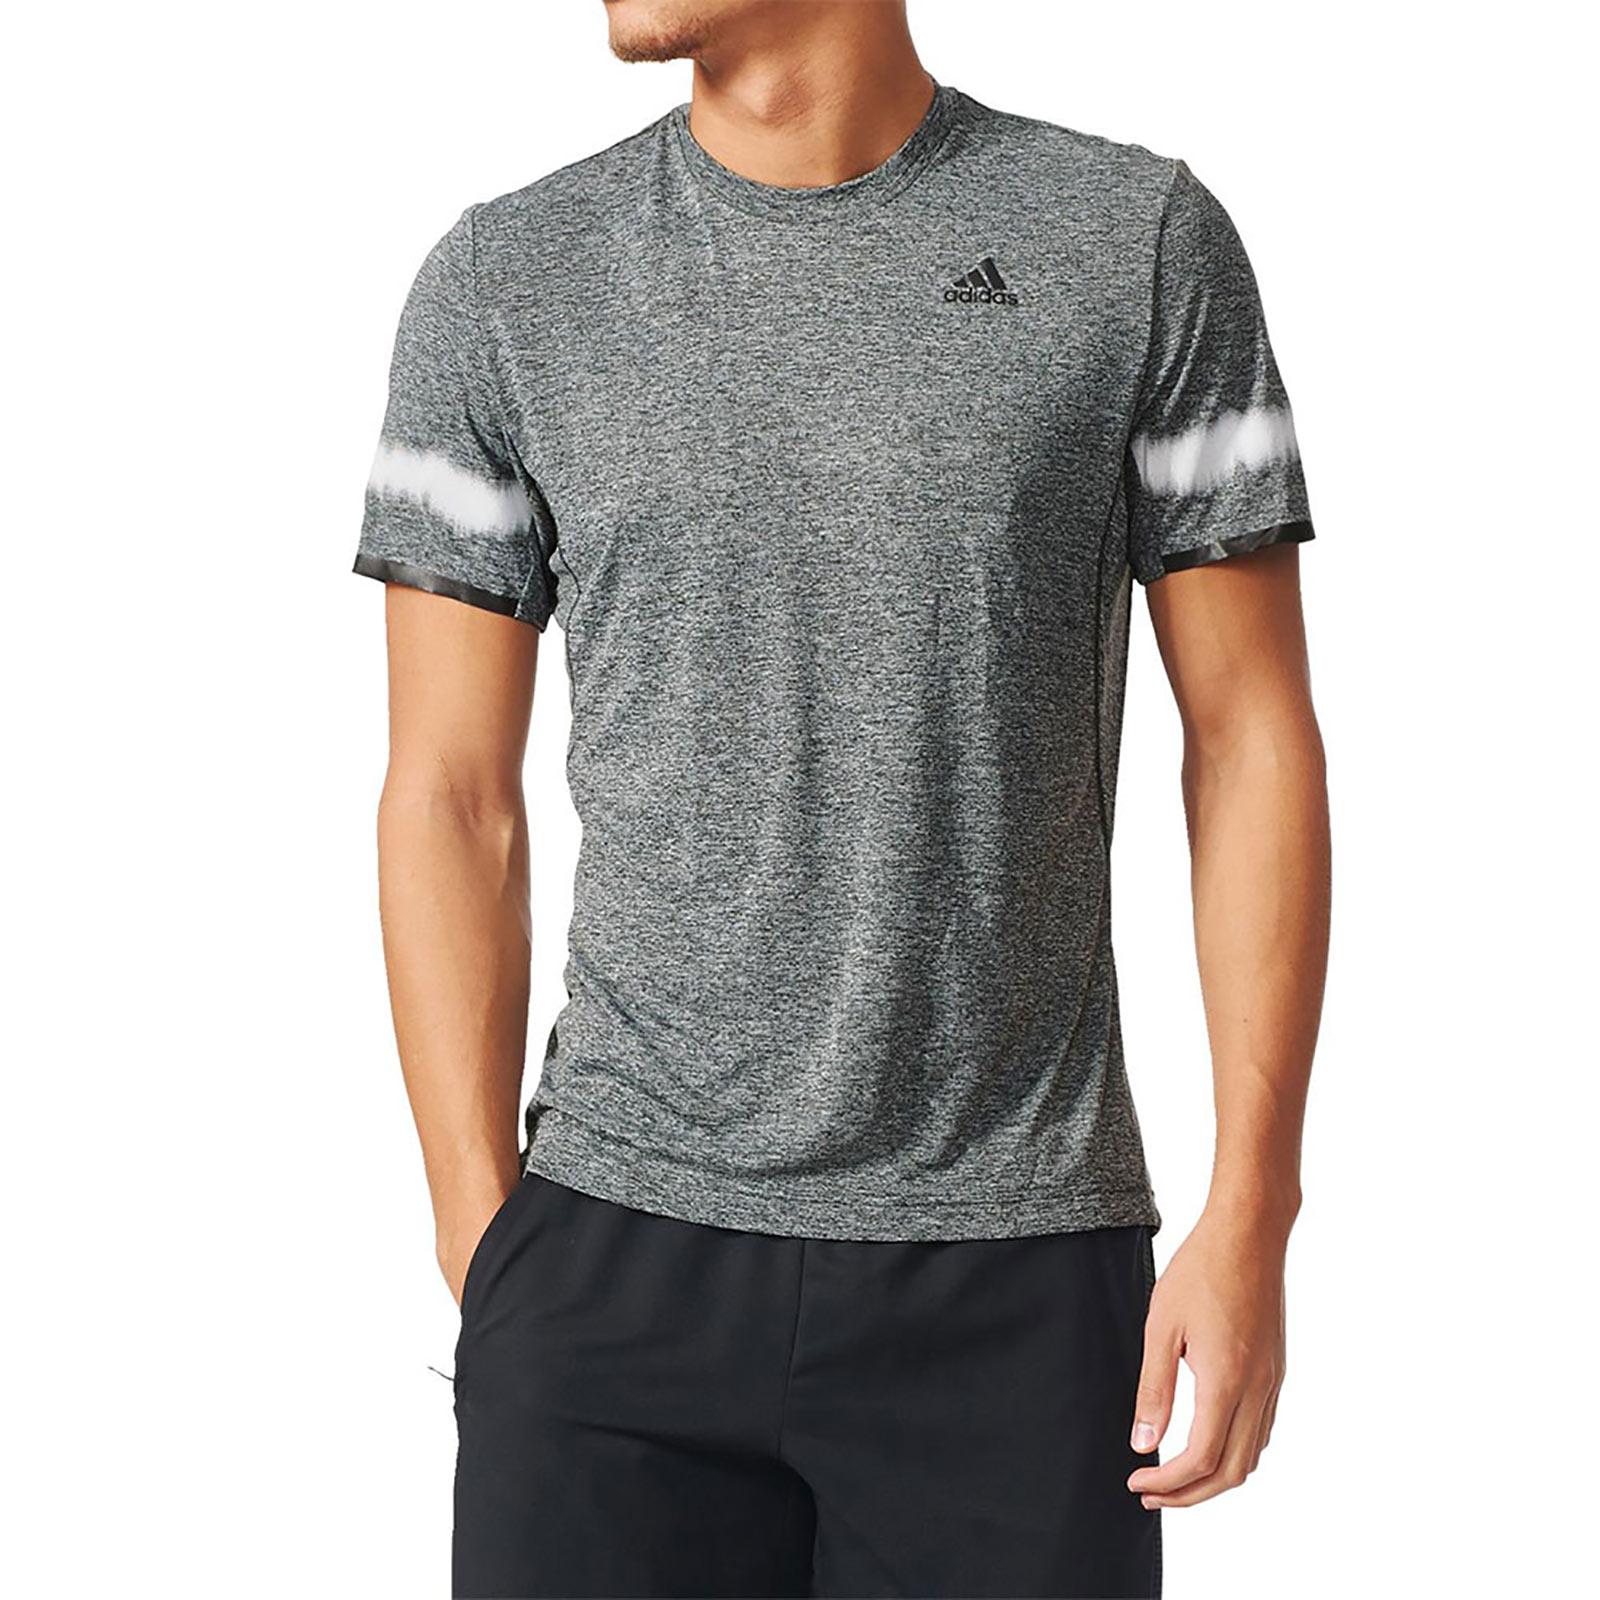 New adidas Kanoi Premium Mens Short Sleeve Running Tee T-shirt Size XL